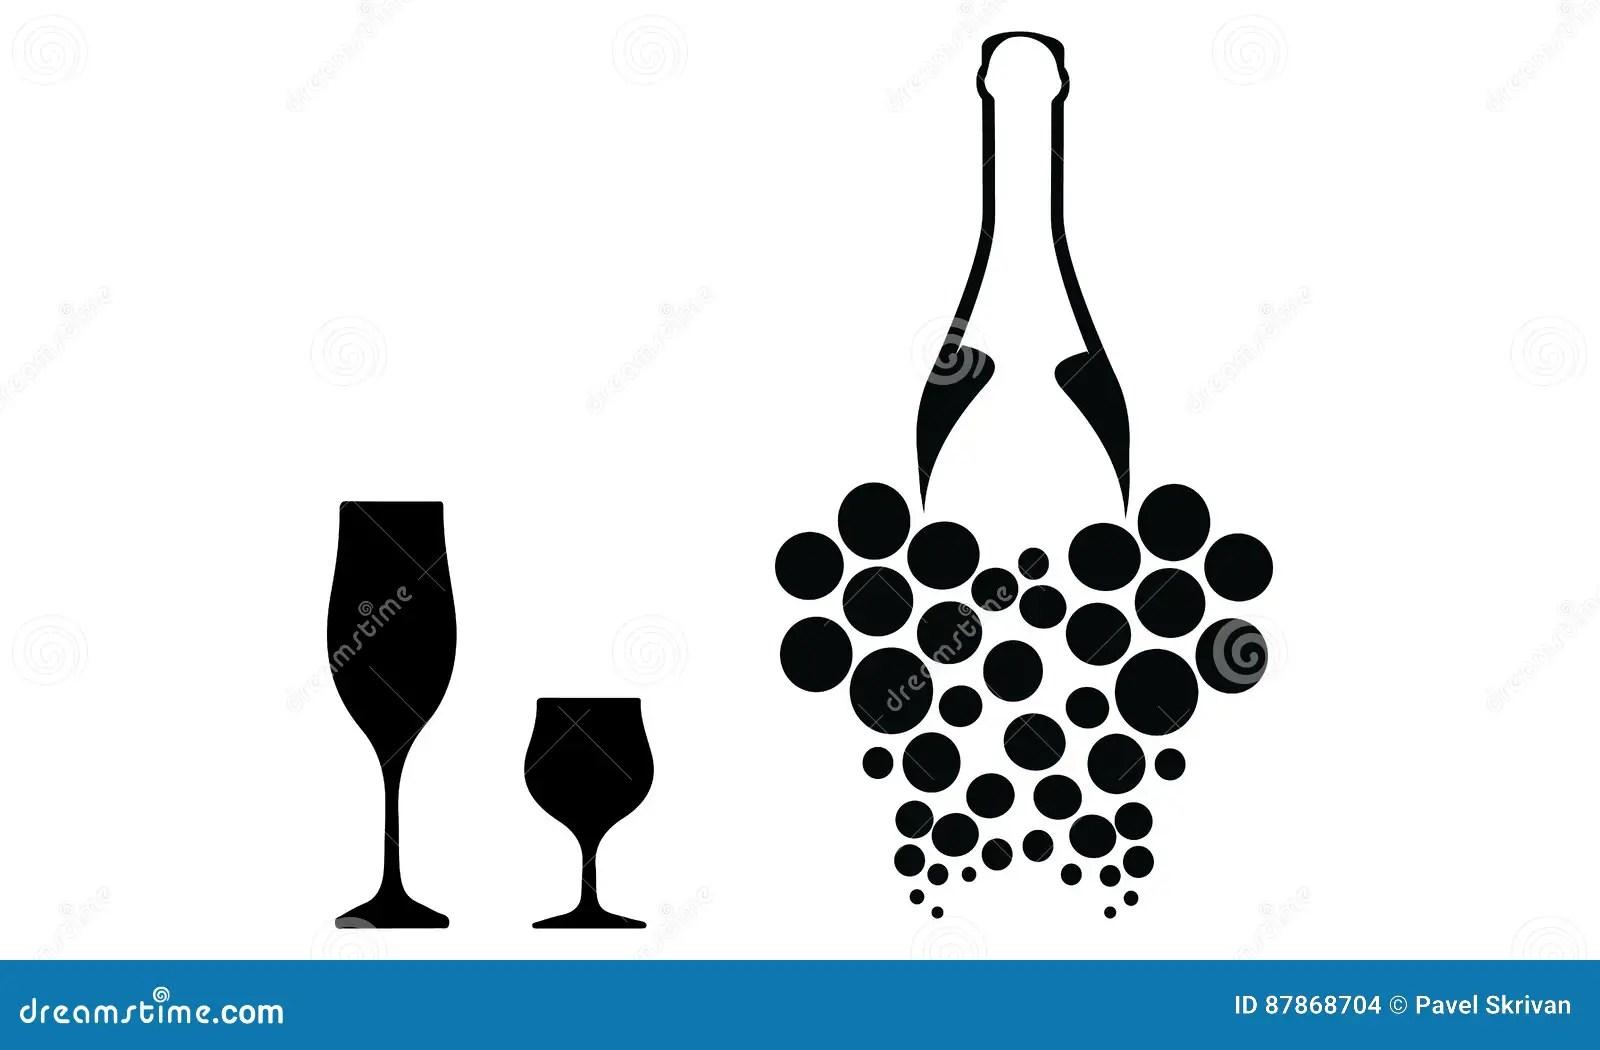 Wine List stock illustration. Illustration of concept